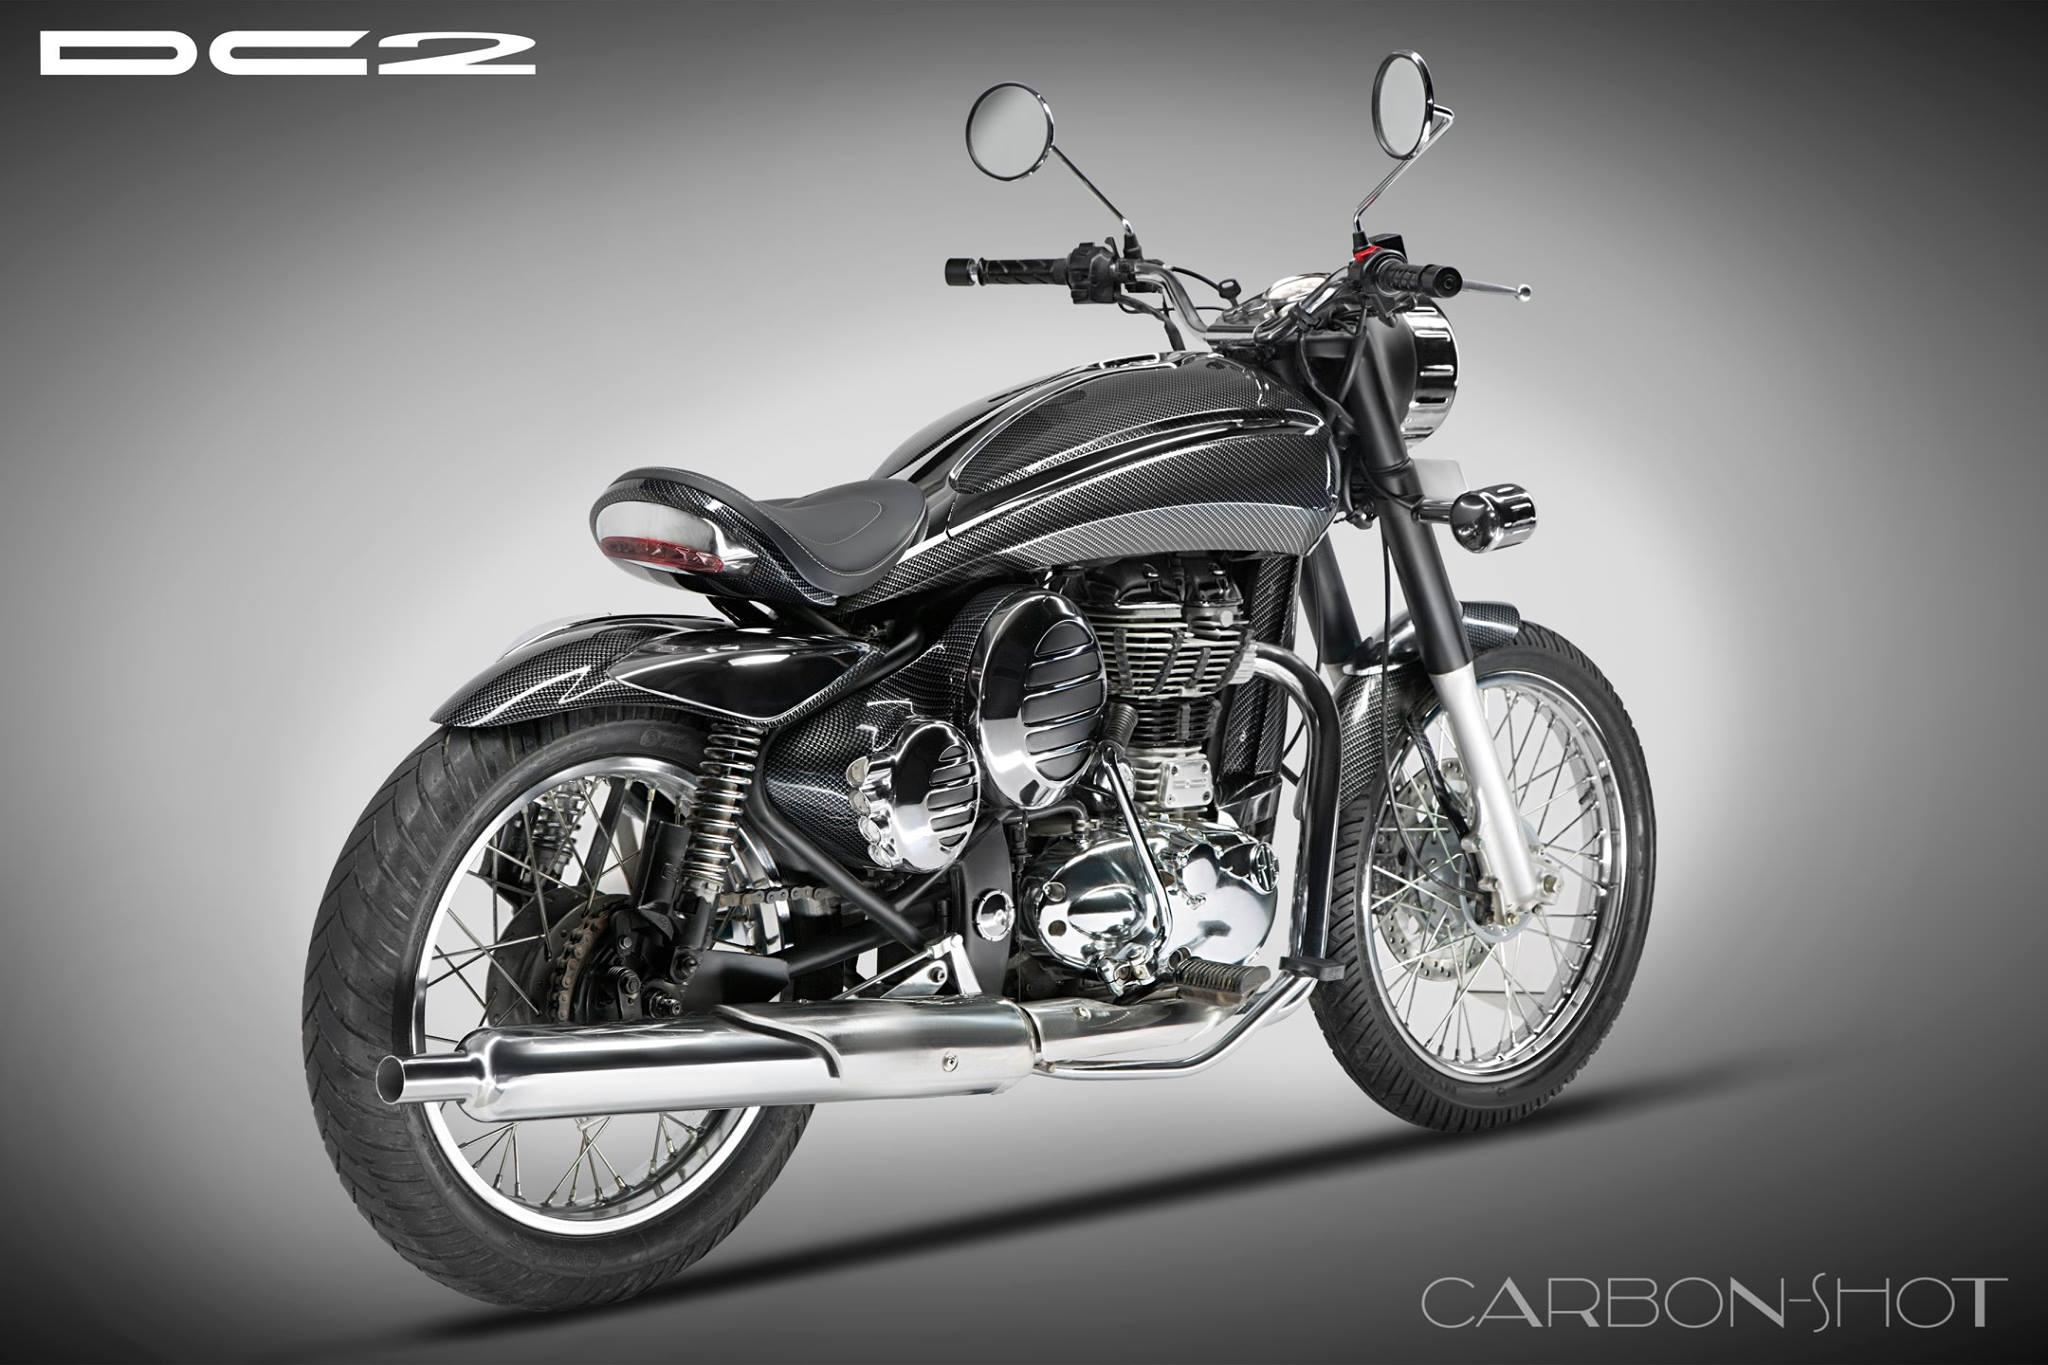 Dc Design Royal Enfield Classic Bullet 350 500 Black Dc2 Carbonshot